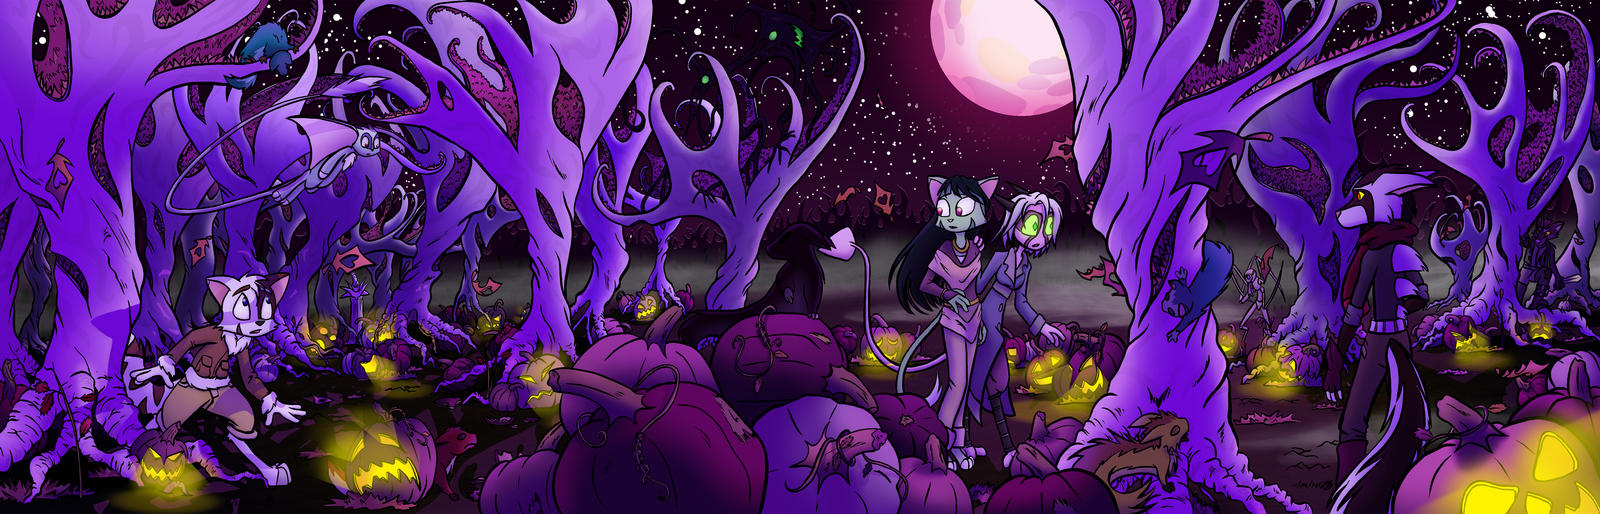 DK: Purple Forest by byakurai1313